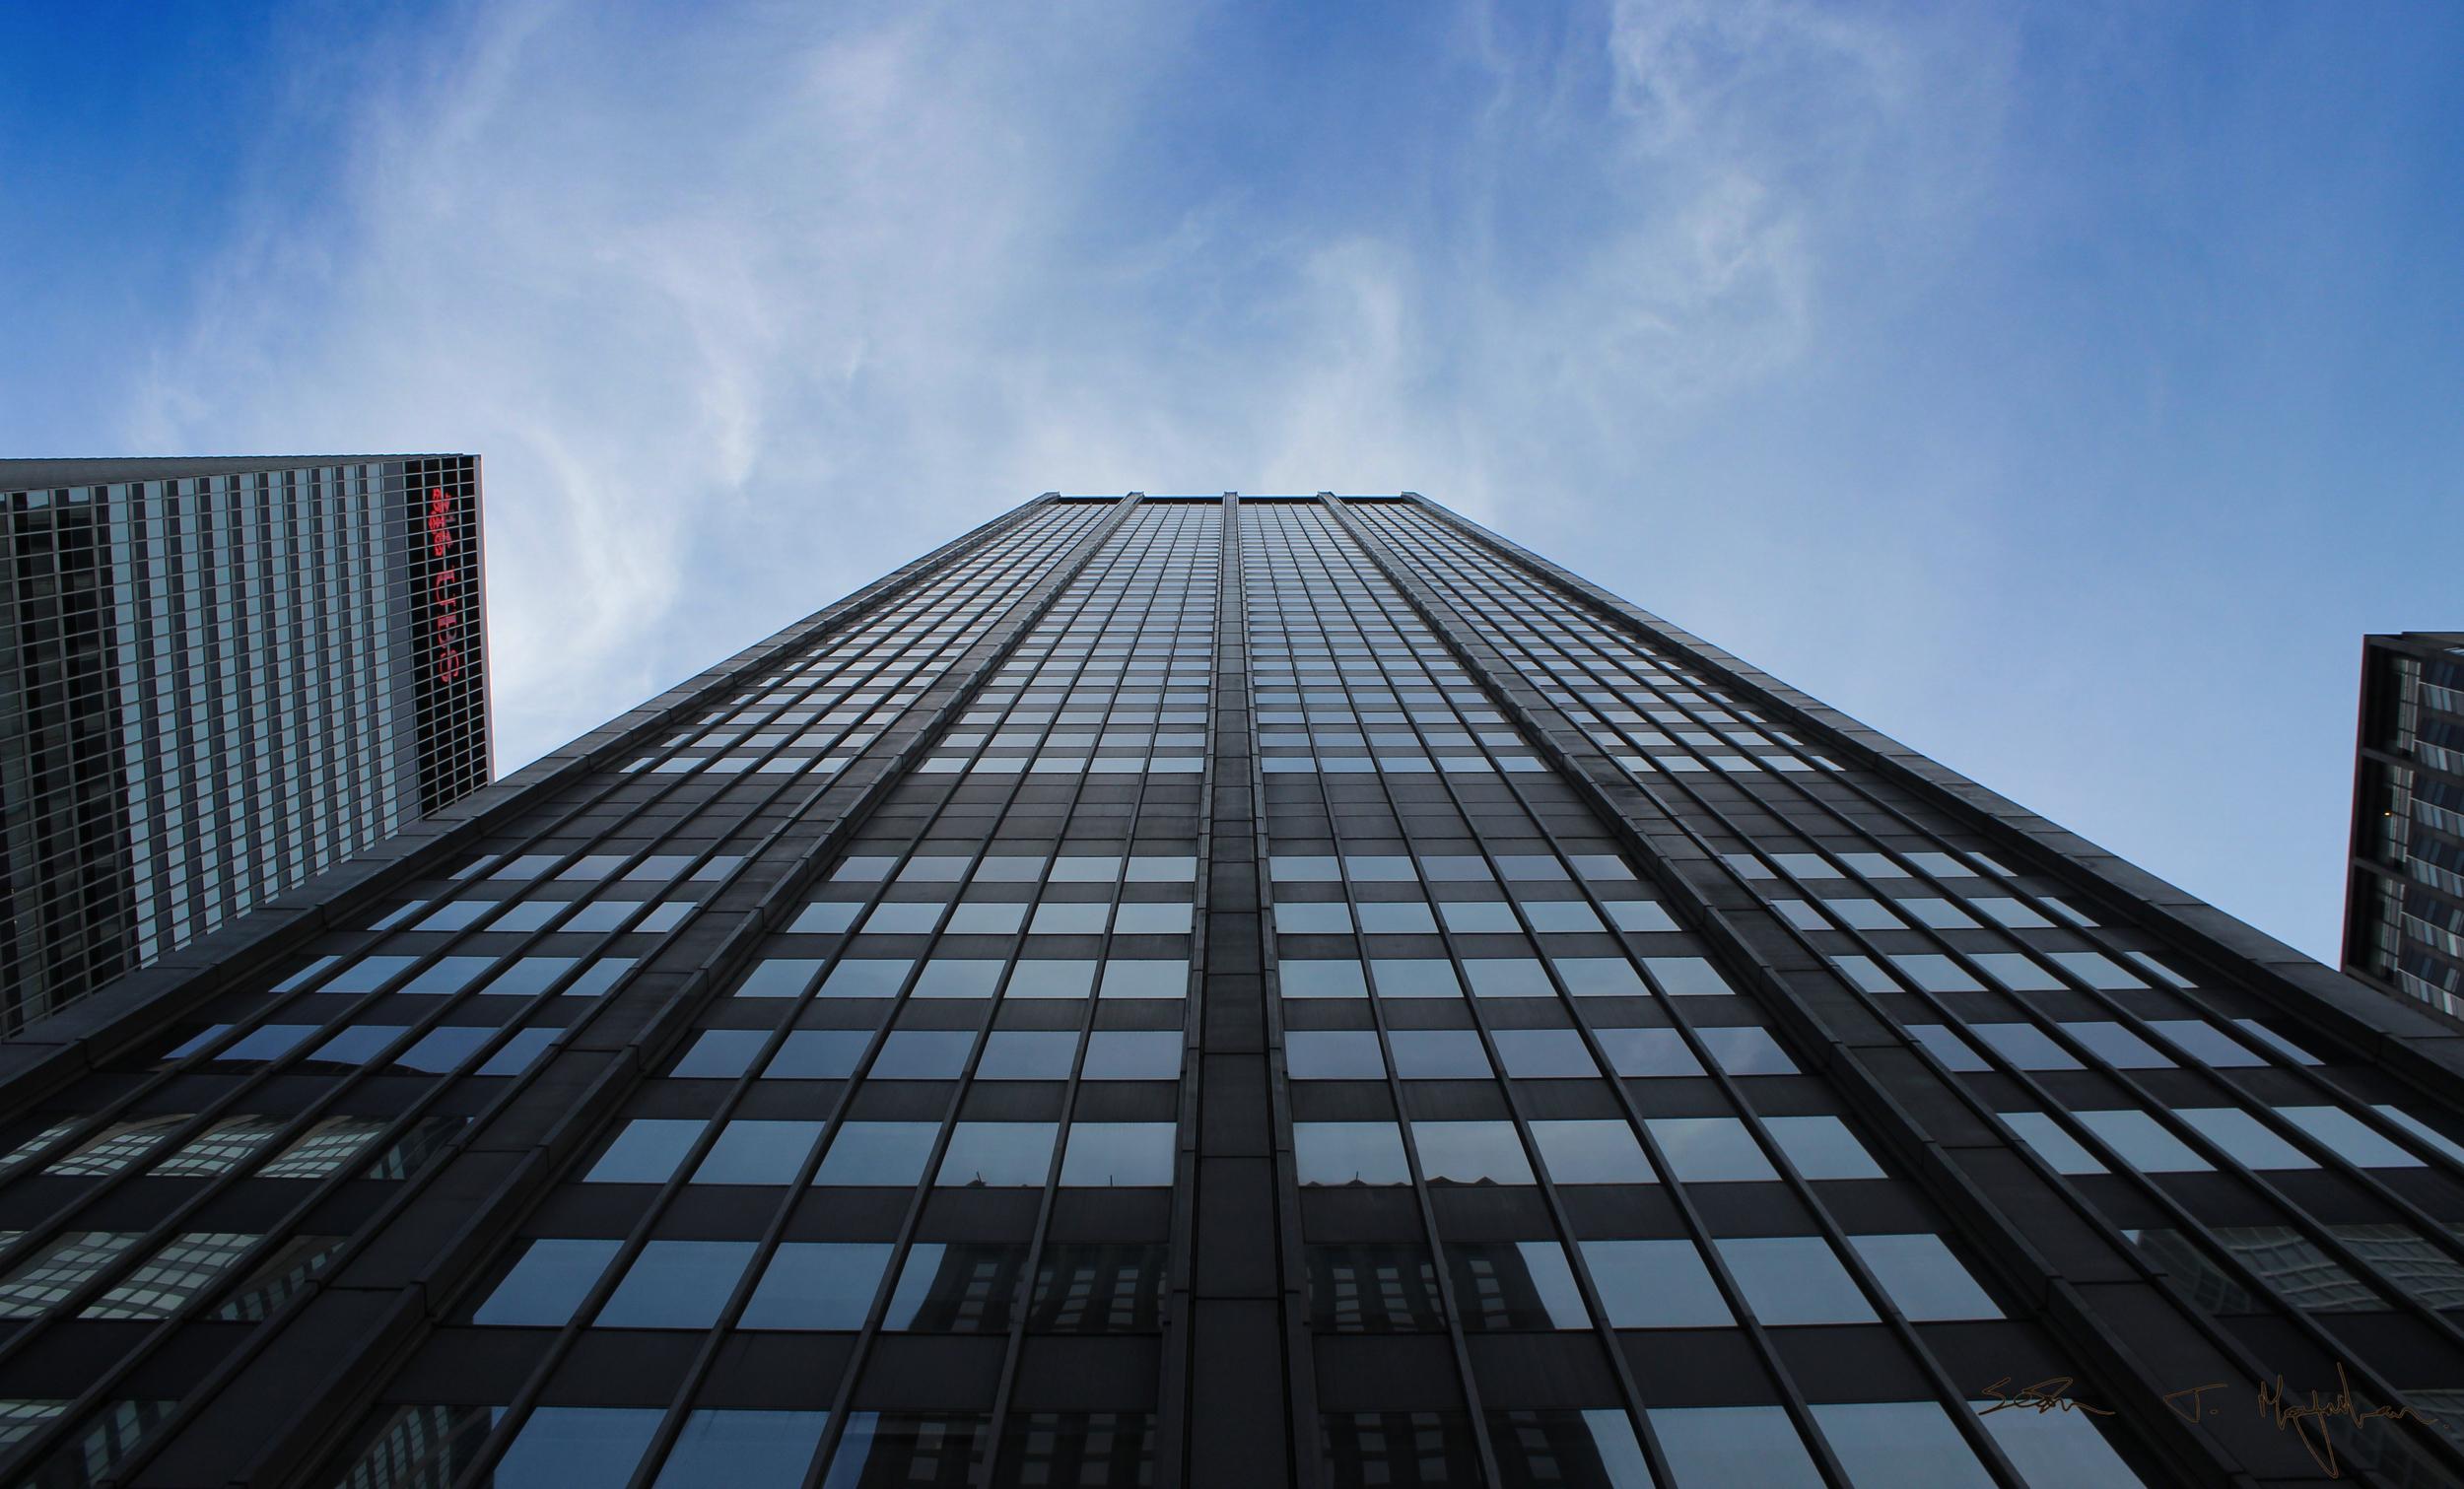 NY Skyscraper Looking Up 1.jpg